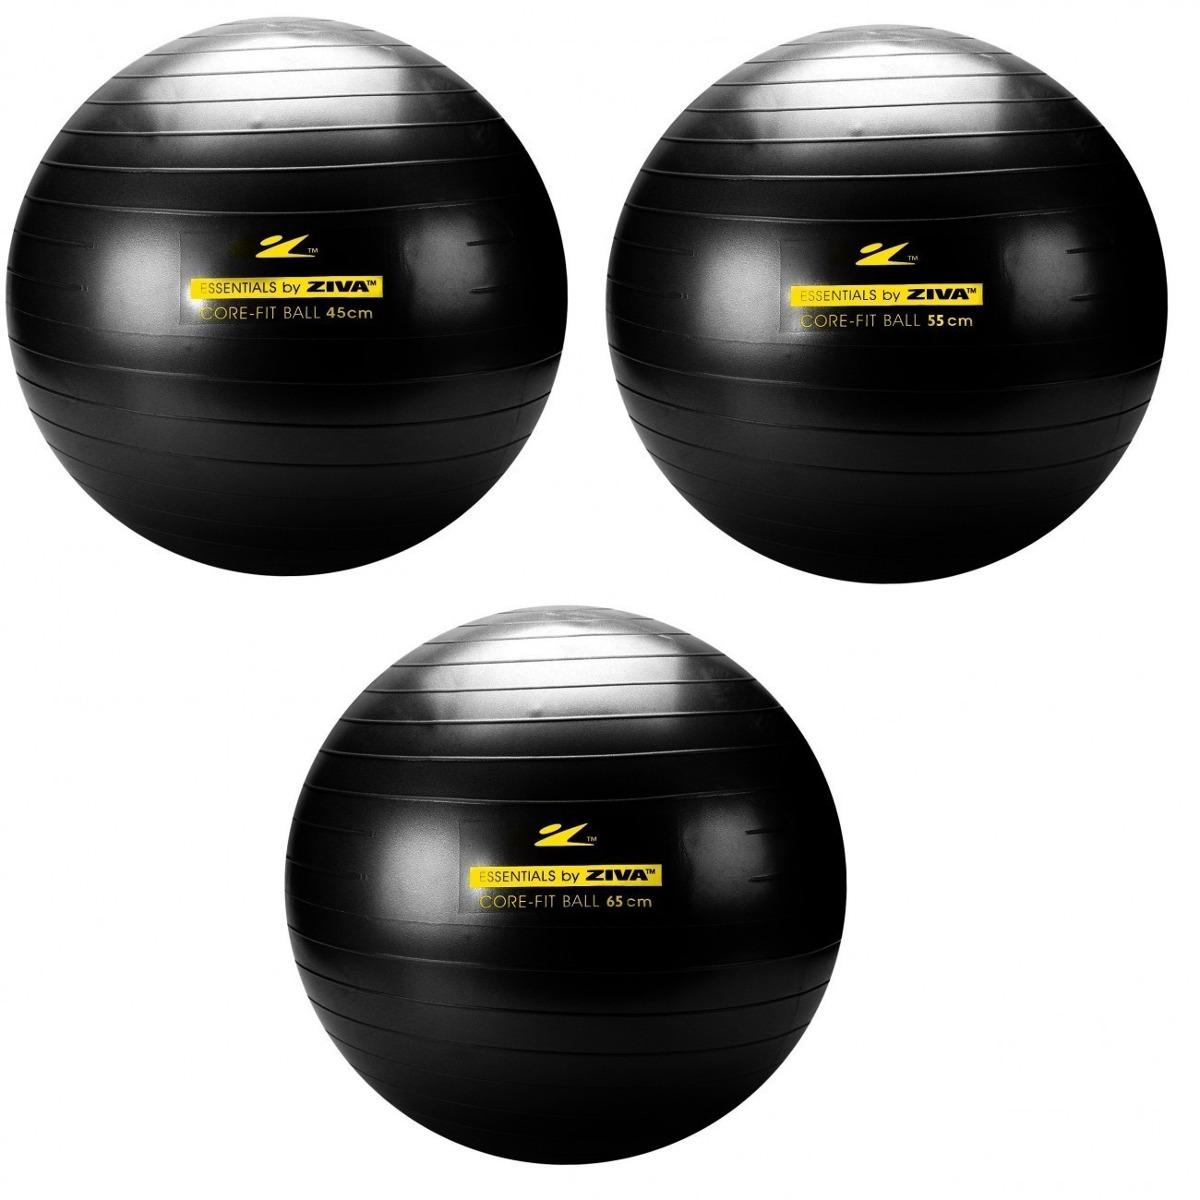 Kit 3 Bola Suiça Para Pilates Yoga C  Bomba 45 55 65 Cm - R  80 e482e7a562810